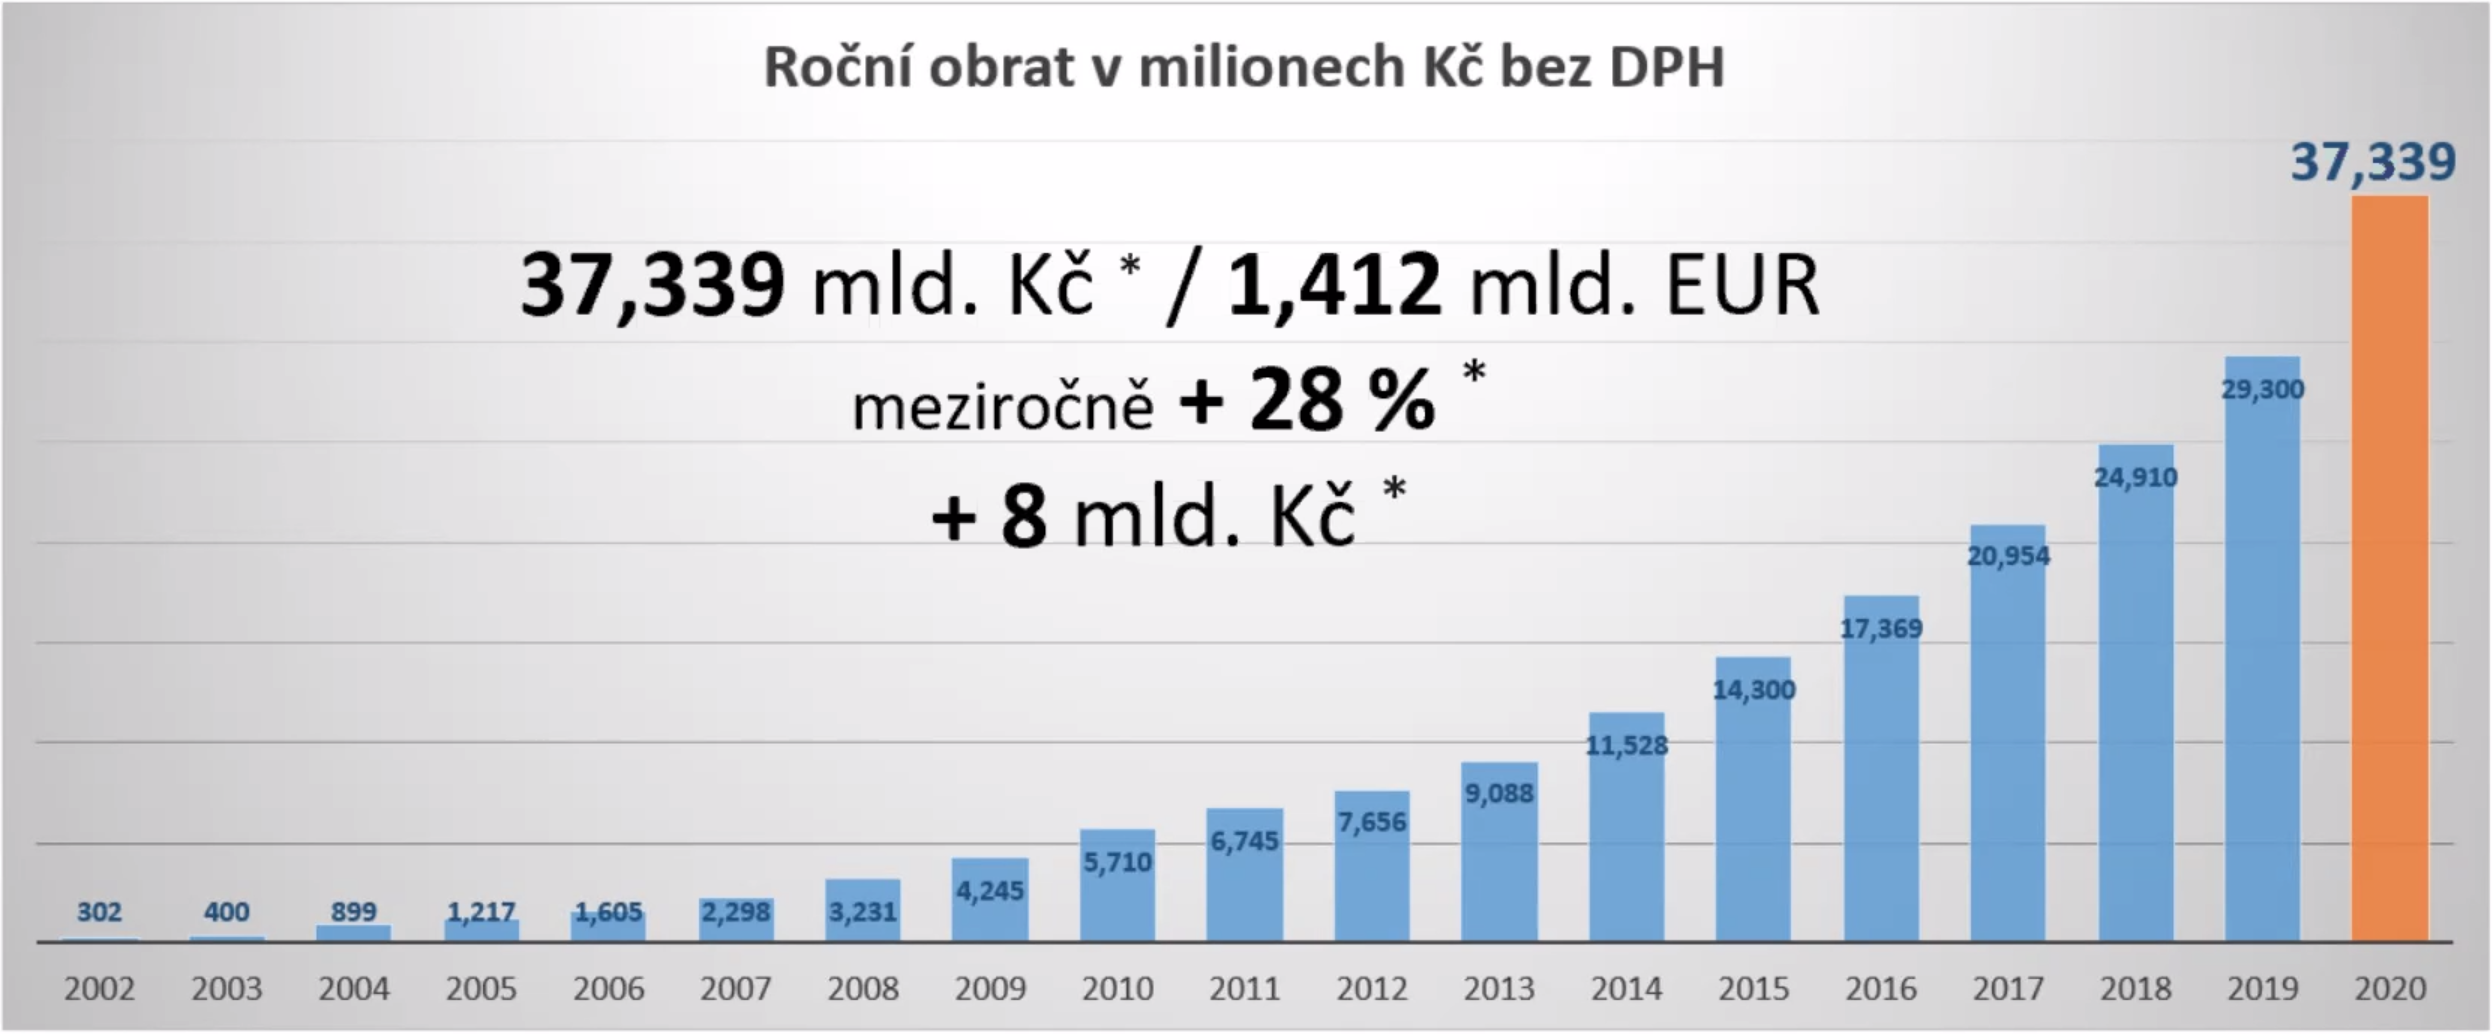 Vývoj obratu Alzy (předběžné, neauditované výsledky). Zdroj: Alza.cz